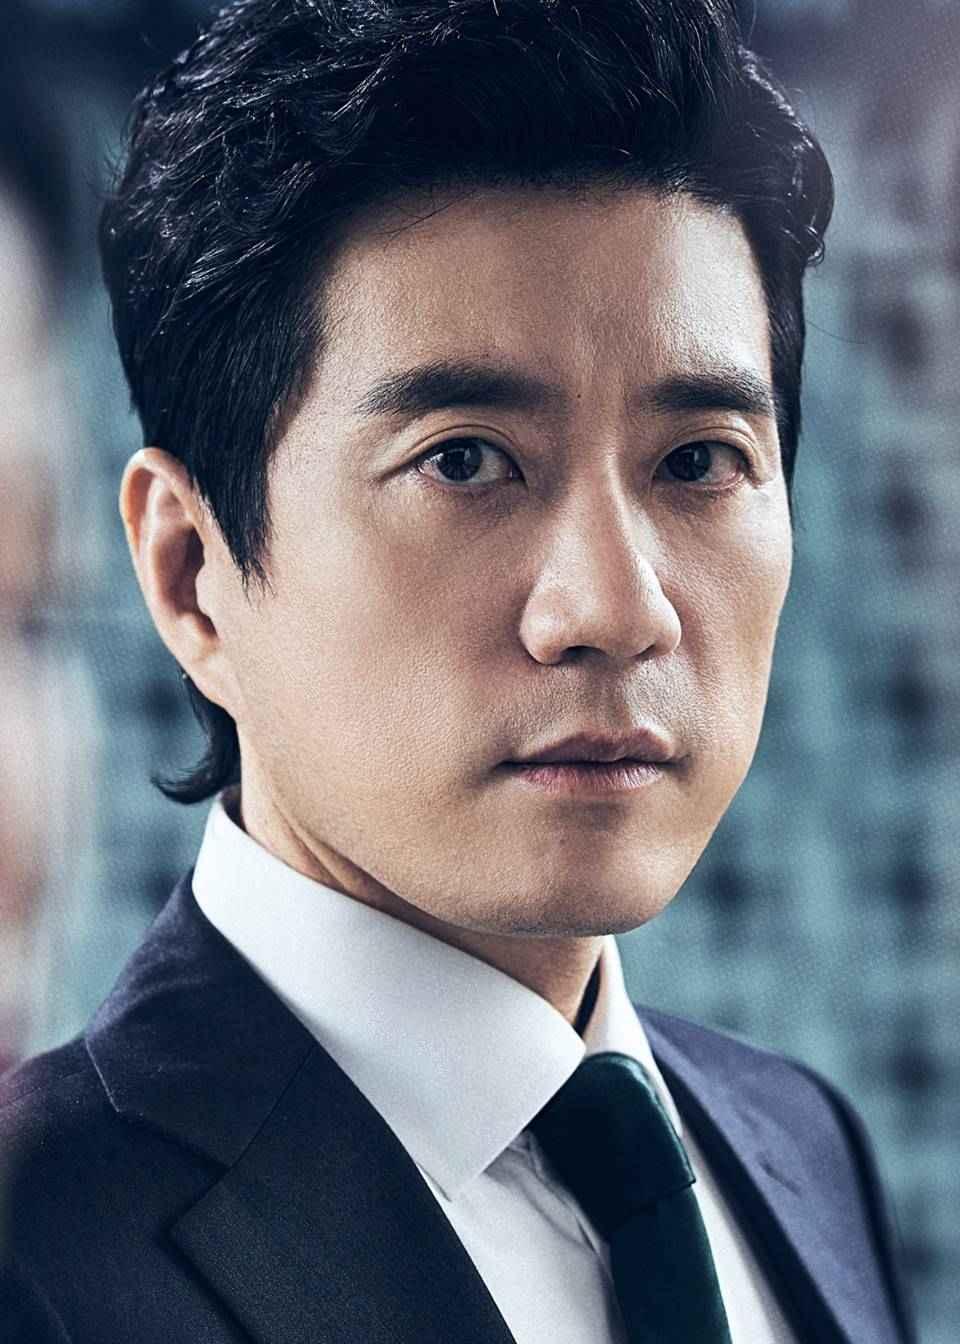 10 Aktor dan Aktris Pemeran Law School, Ada Kim Bum